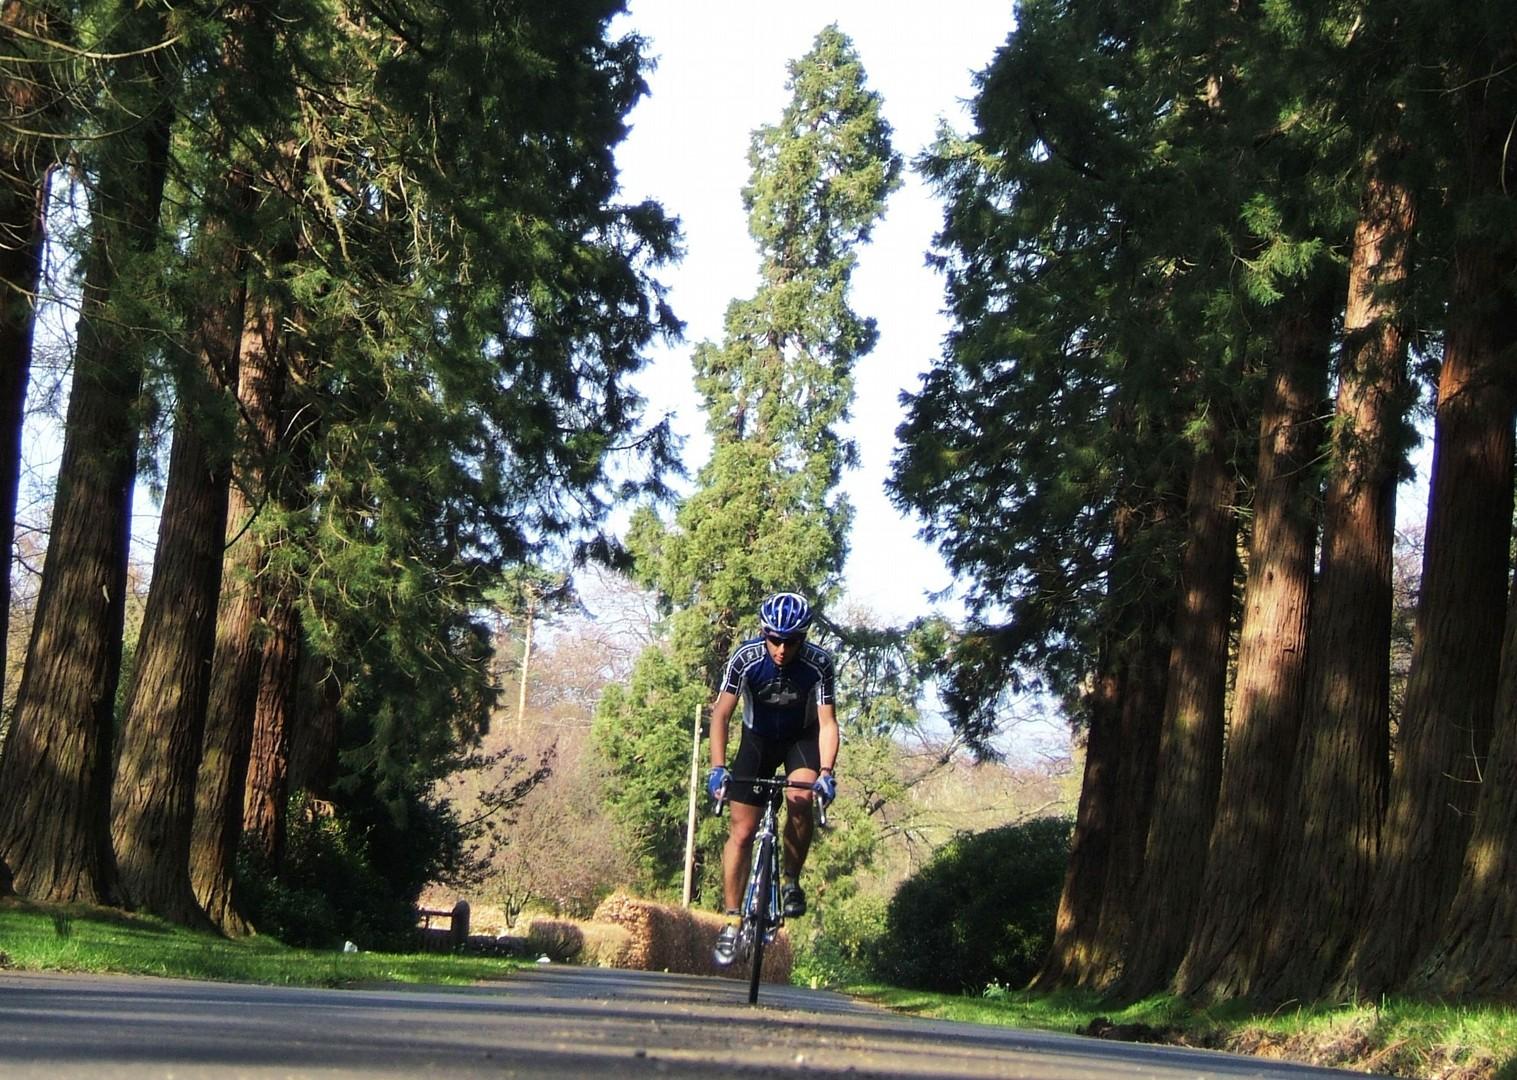 northumberland-woodland-cycling.jpg - UK - Northumberland - Road Cycling